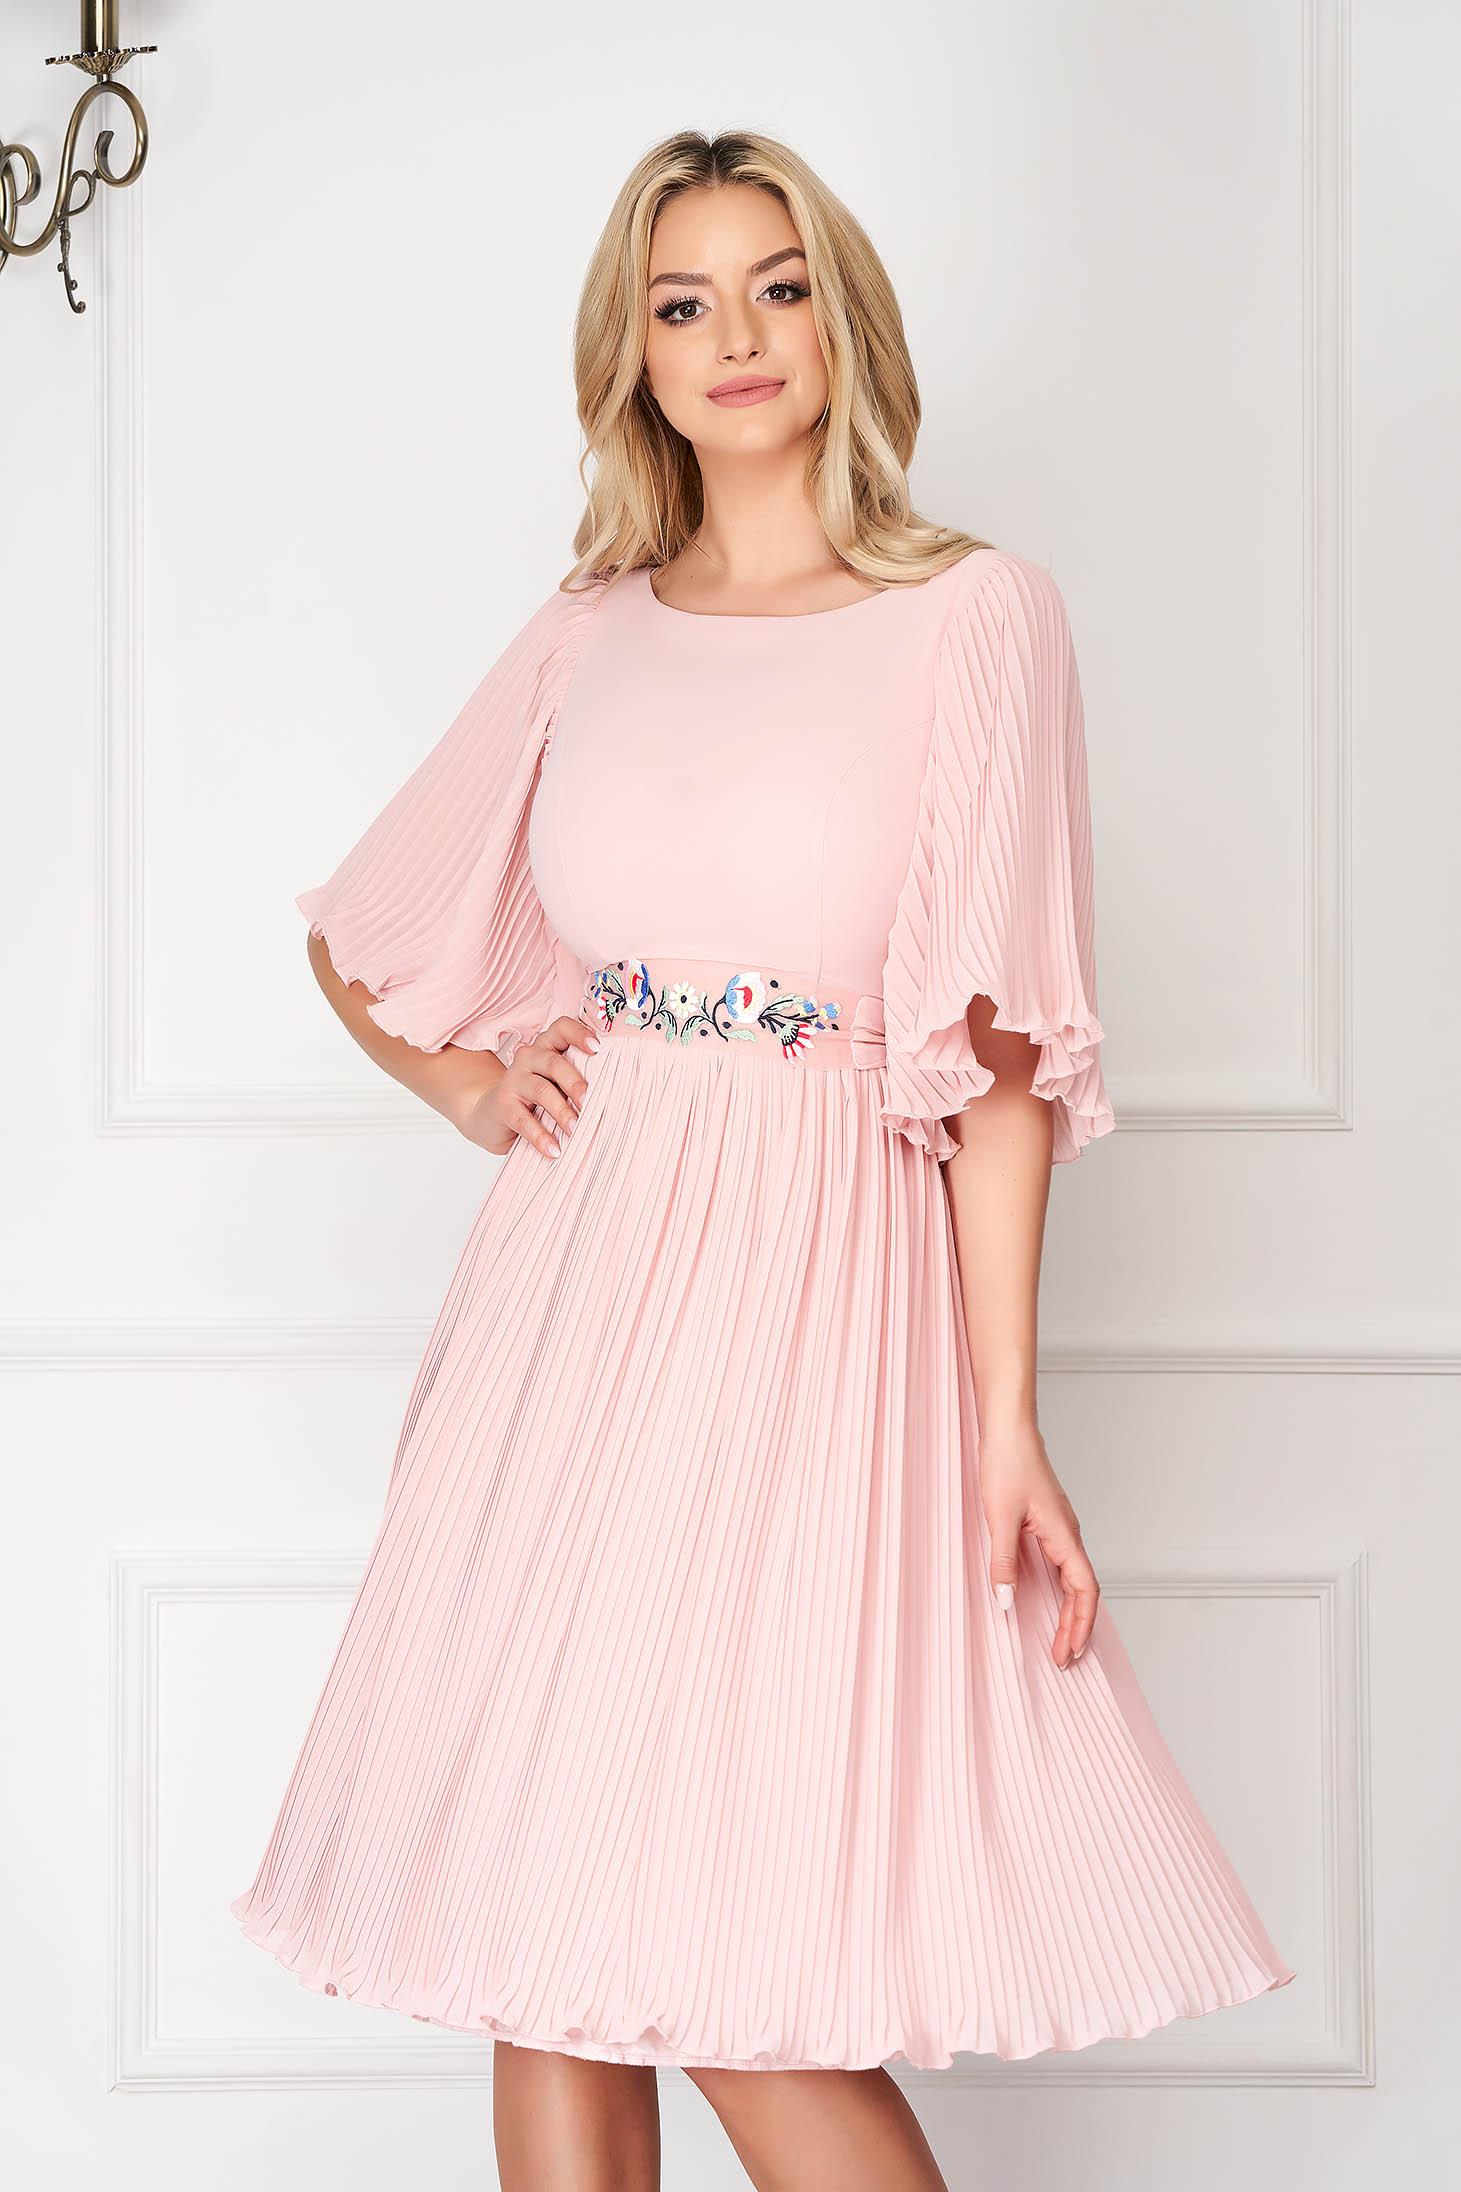 Dress StarShinerS lightpink elegant midi from veil fabric folded up detachable cord